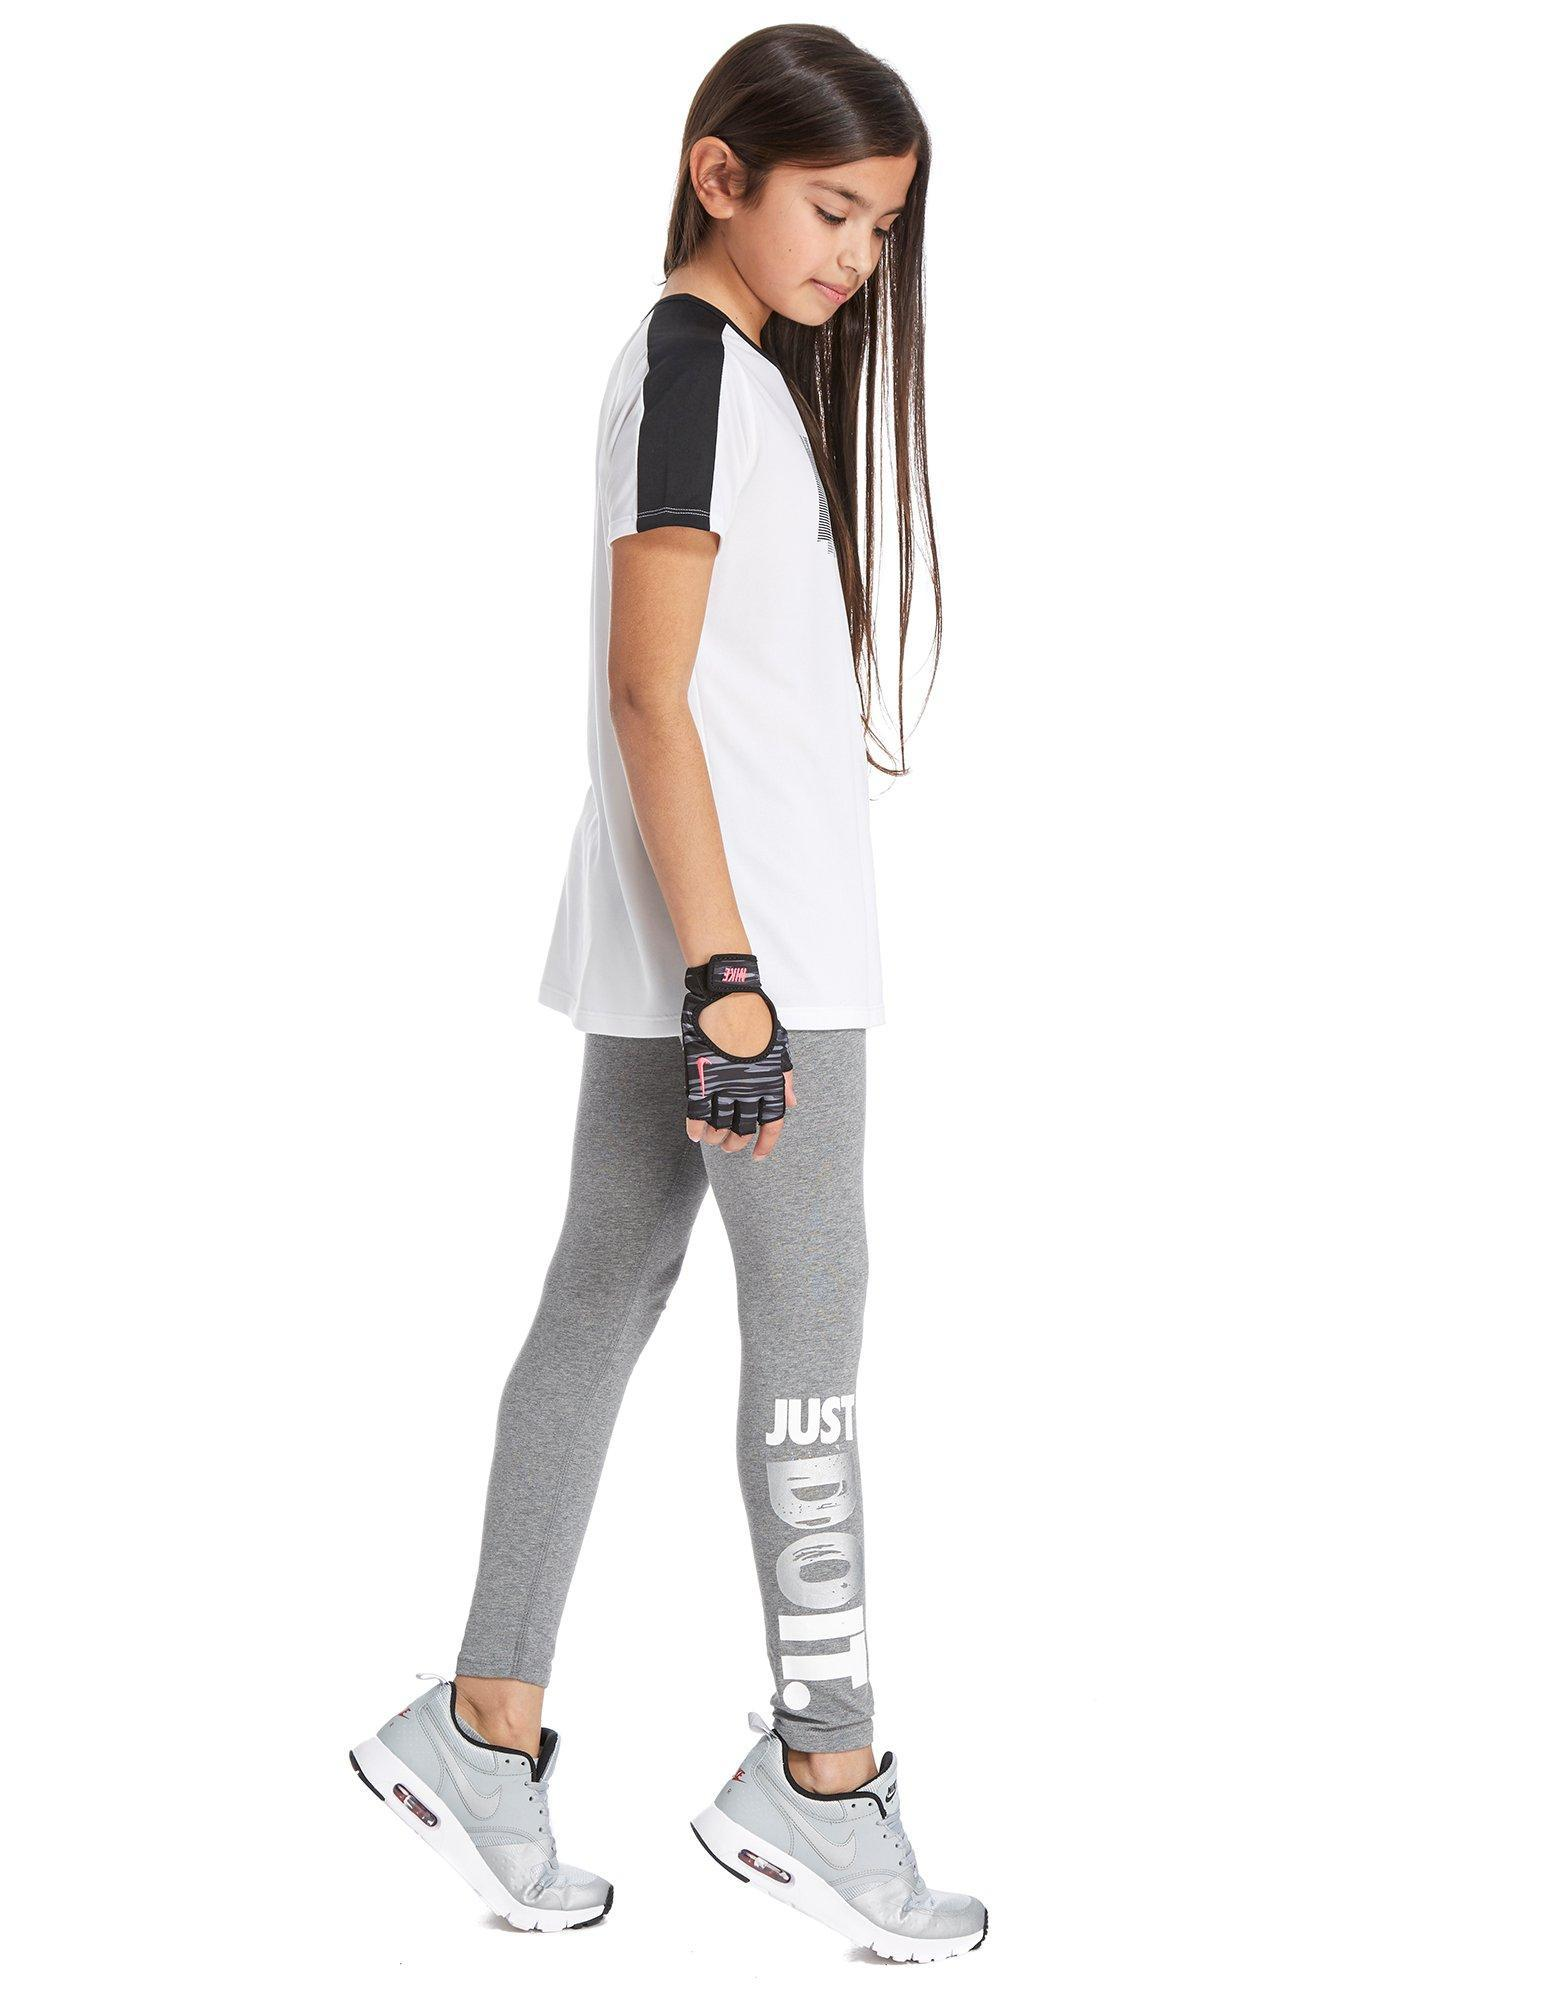 Nike Girlsu0026#39; Just Do It Leggings Junior in Gray - Lyst